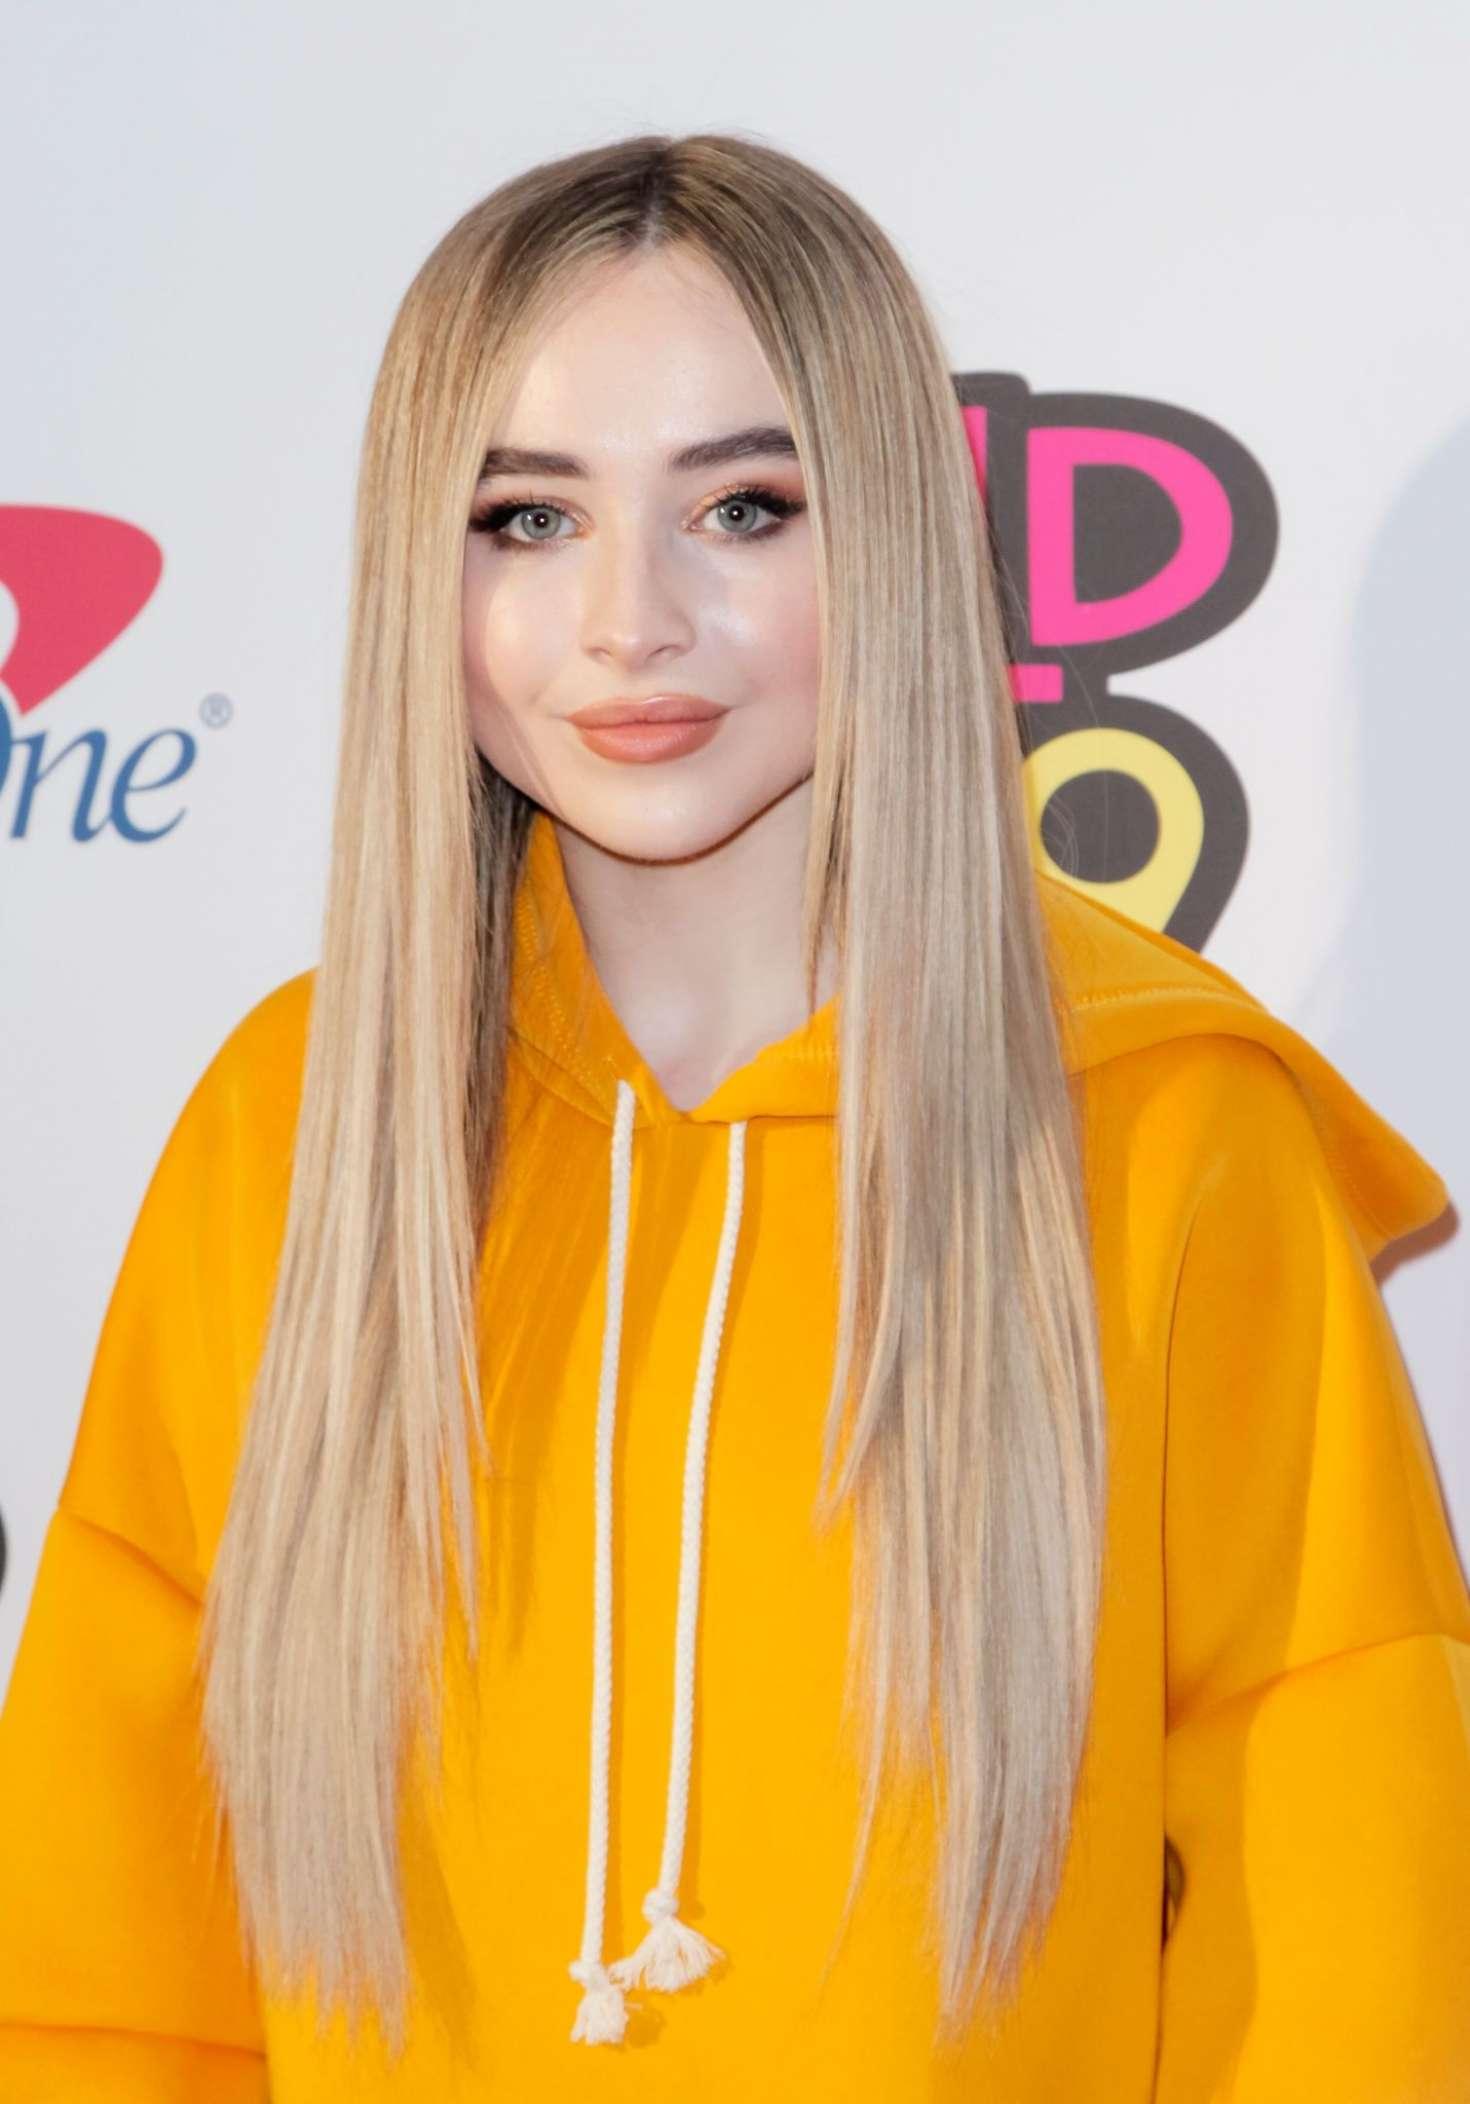 Sabrina Carpenter 2018 : Sabrina Carpenter: 2018 WiLD 94.9s FMs iHeartRadio Jingle Ball -07